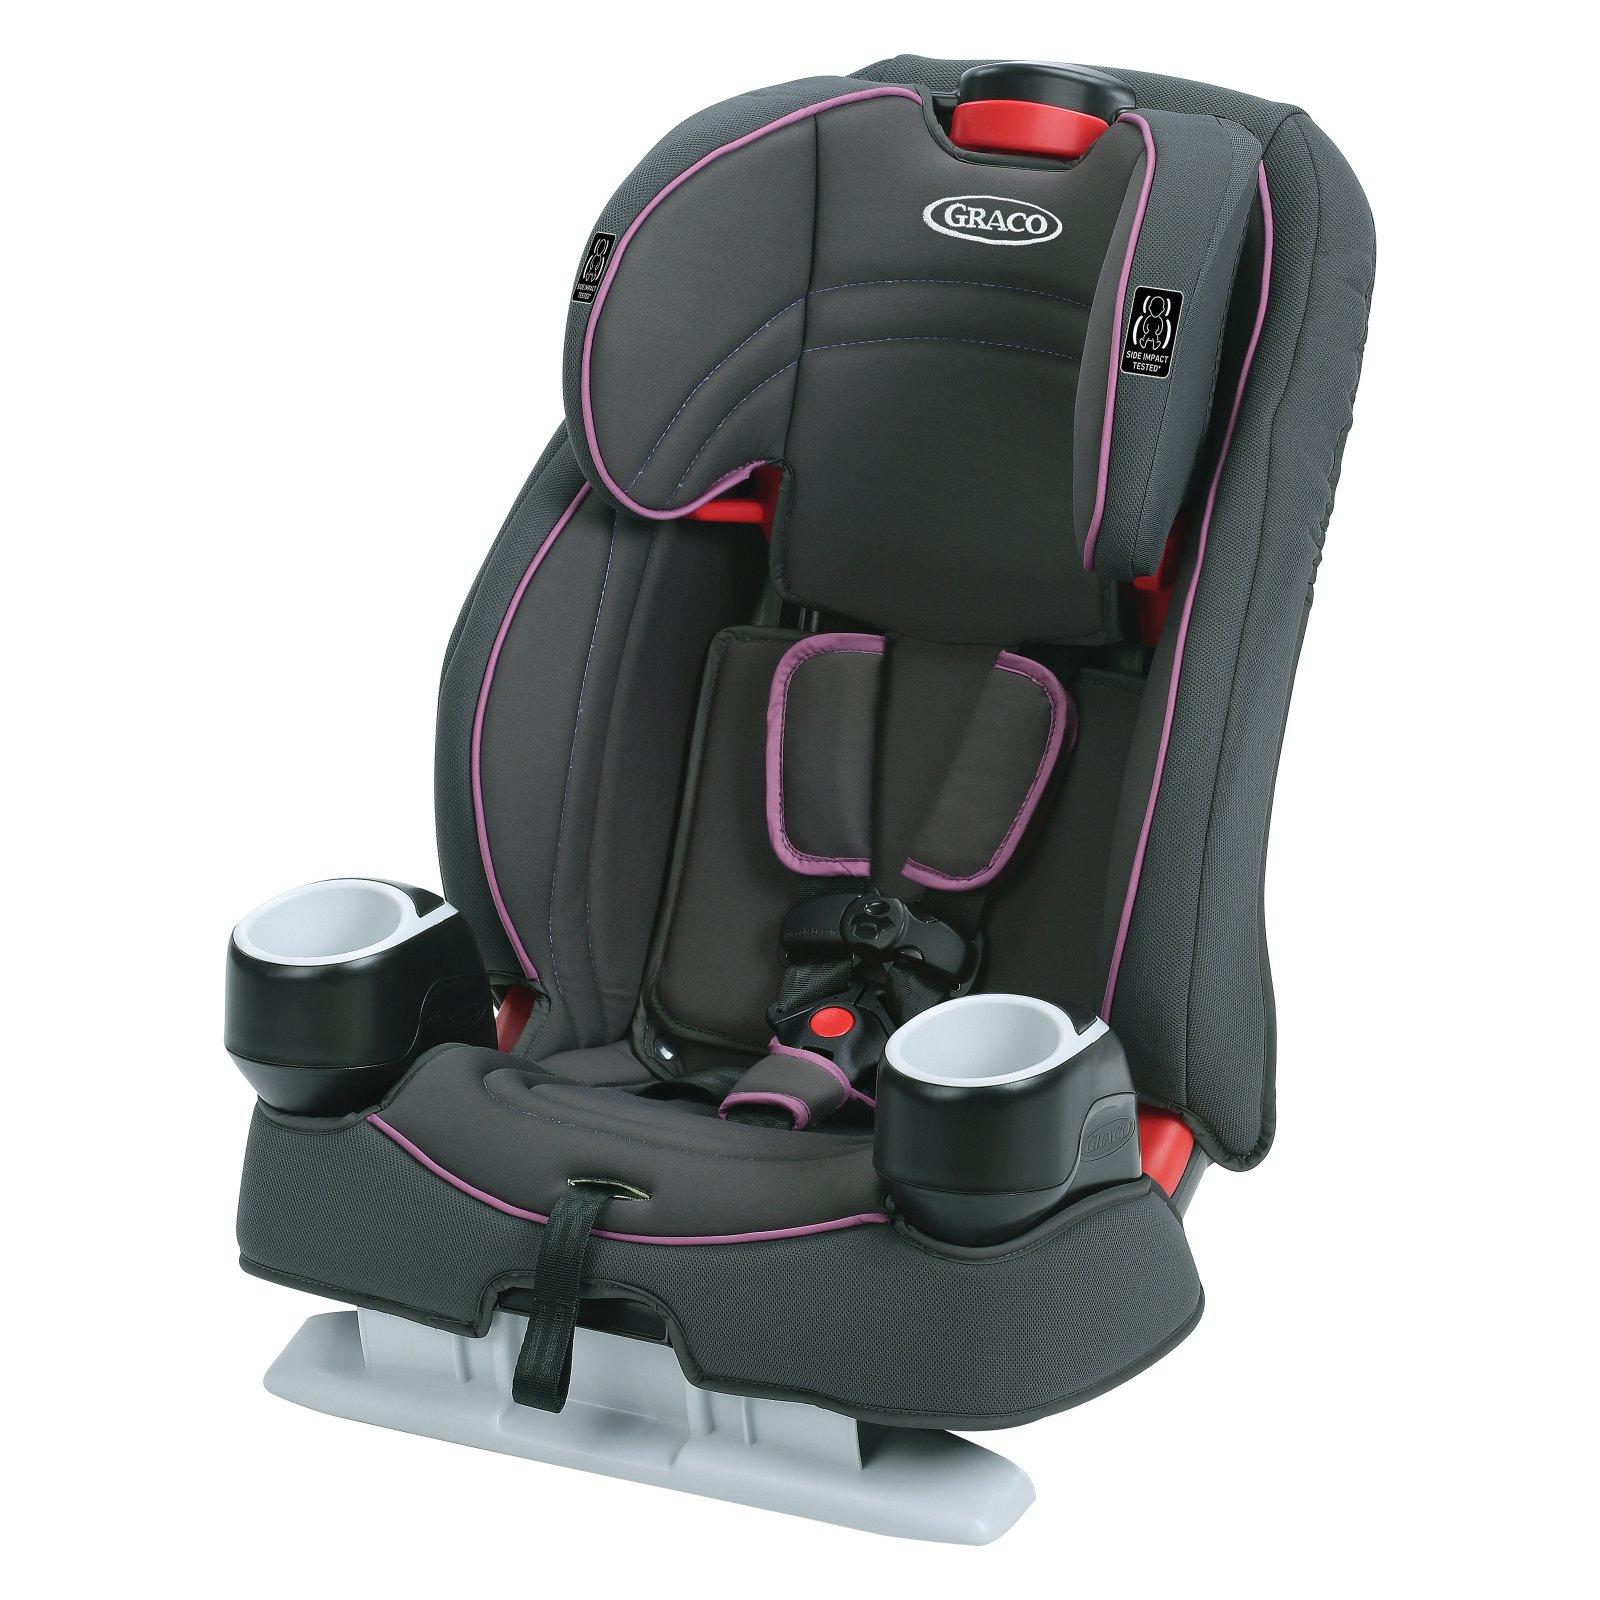 Graco Atlas 65 2-in-1 Harness Booster Car Seat, Choose Yo...